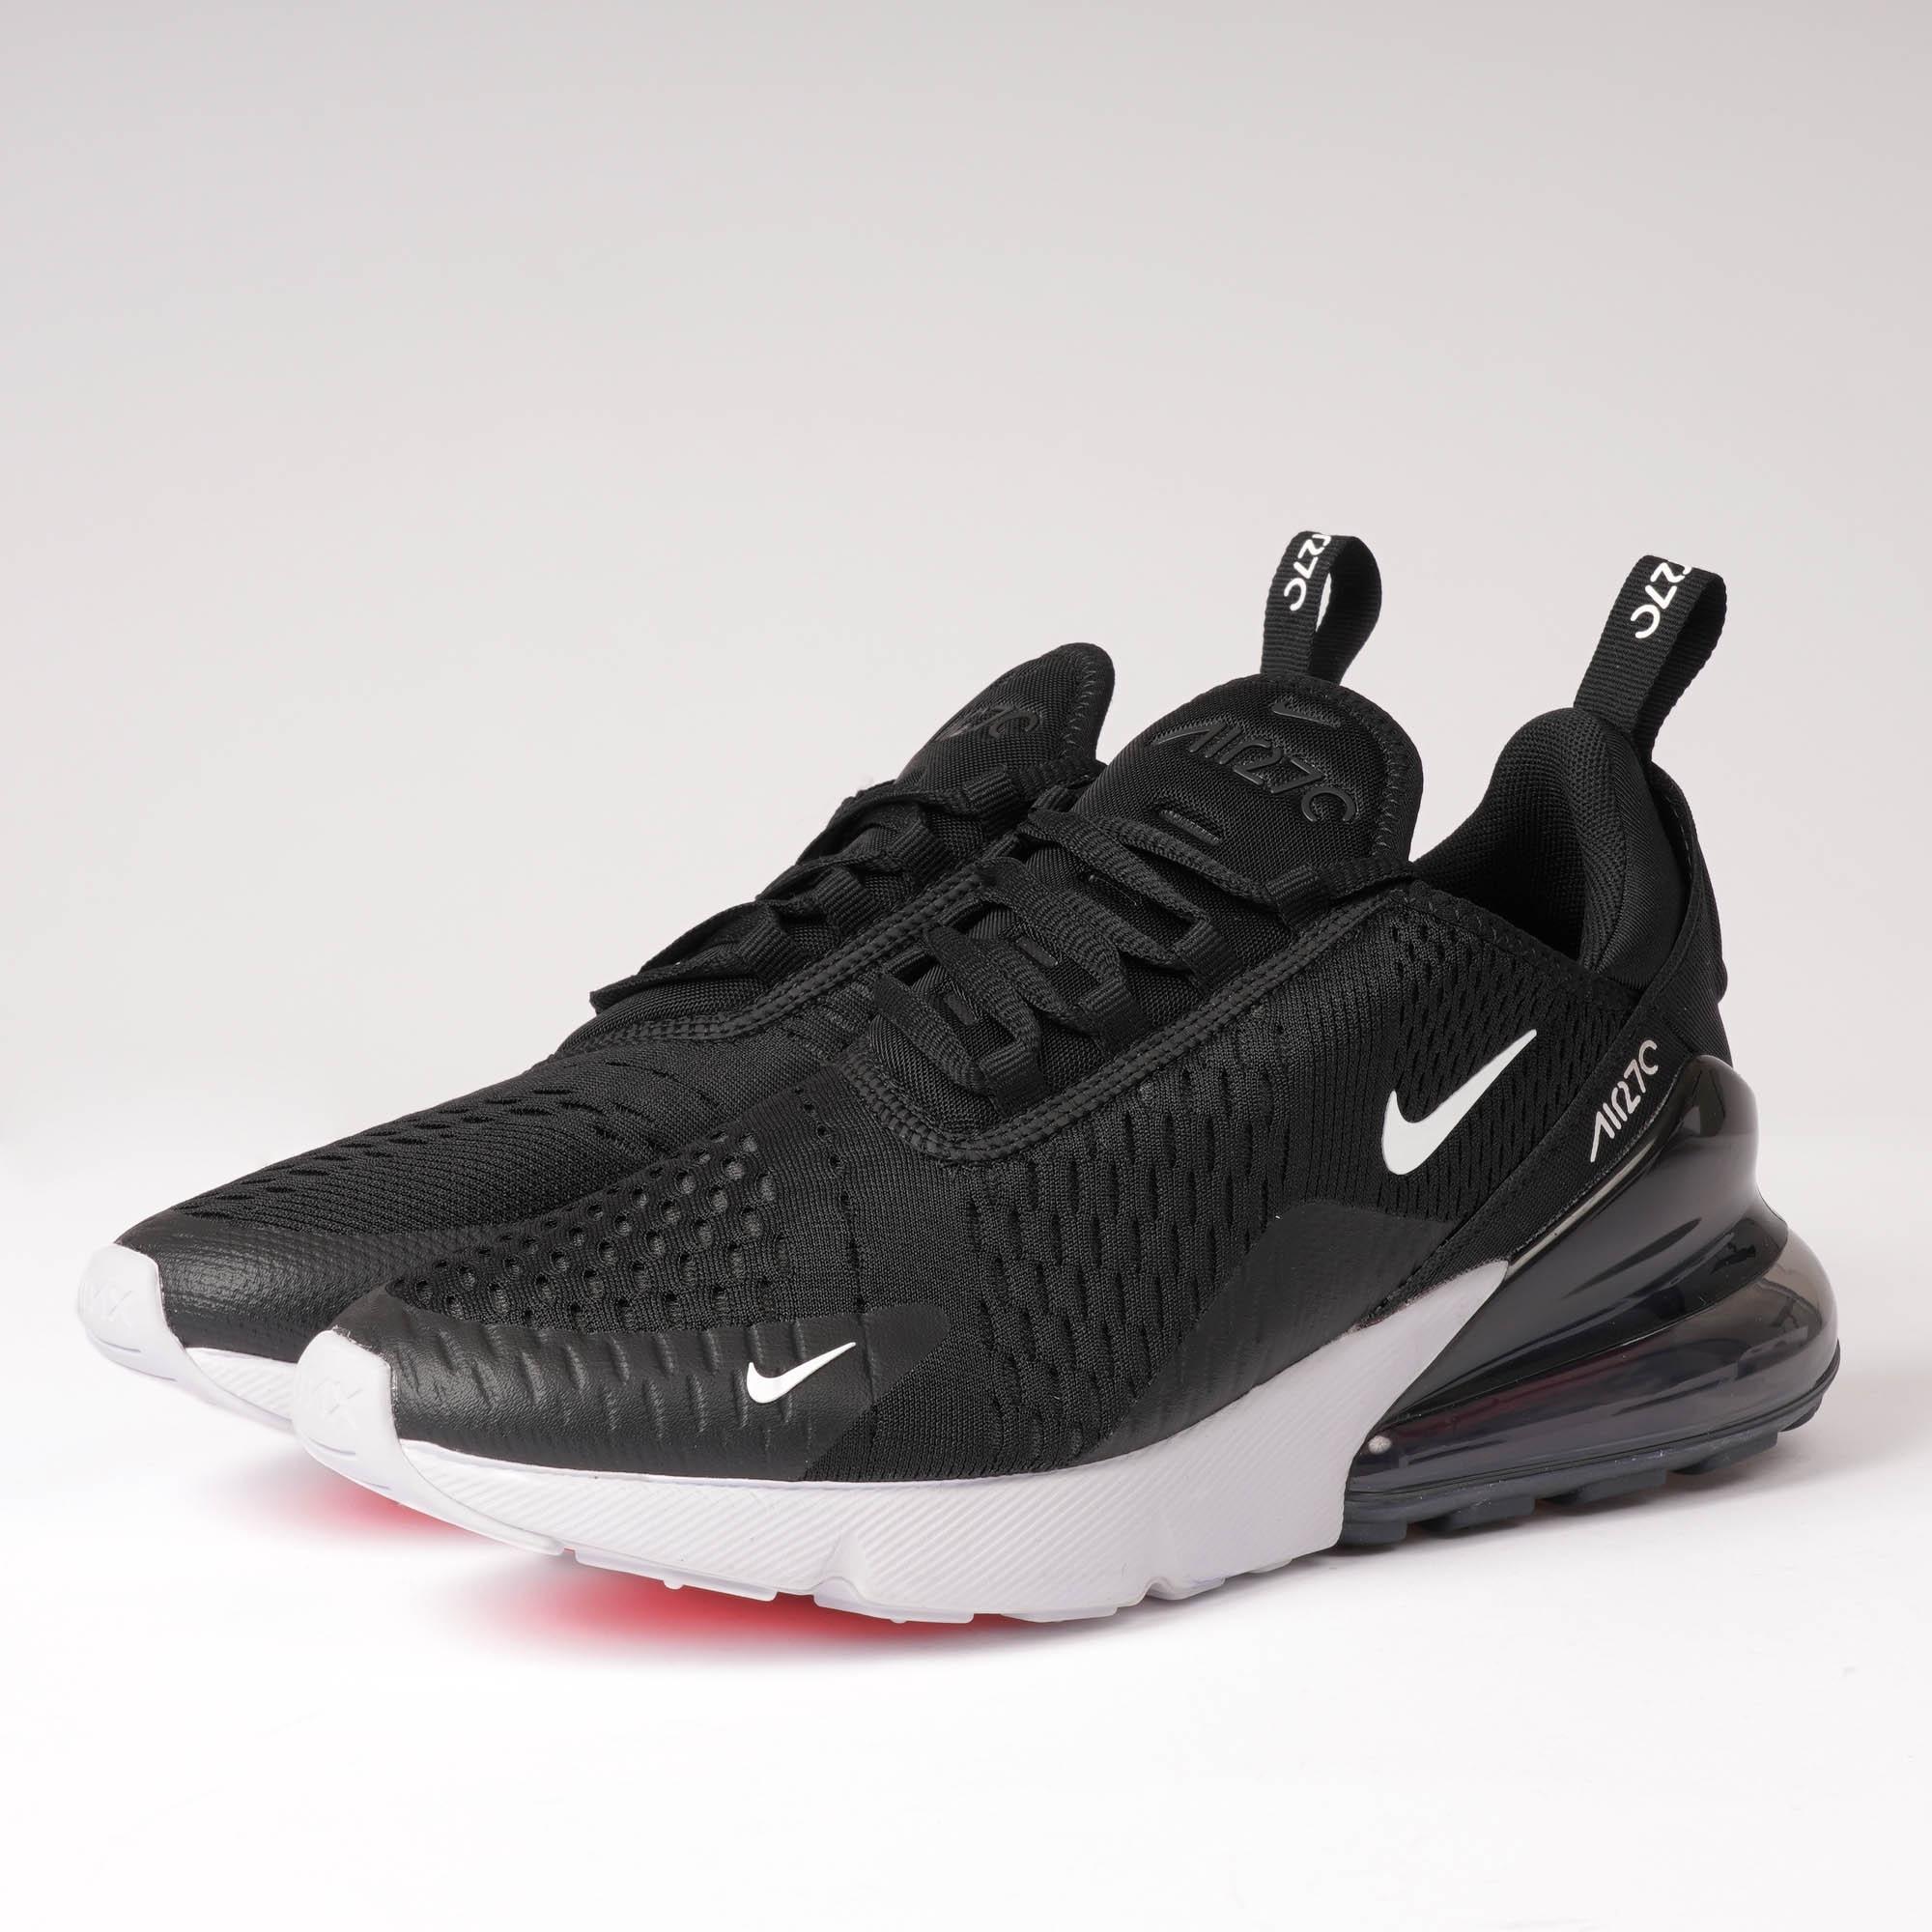 6d794ed8a60159 Nike. Men s Air Max 270 - Black